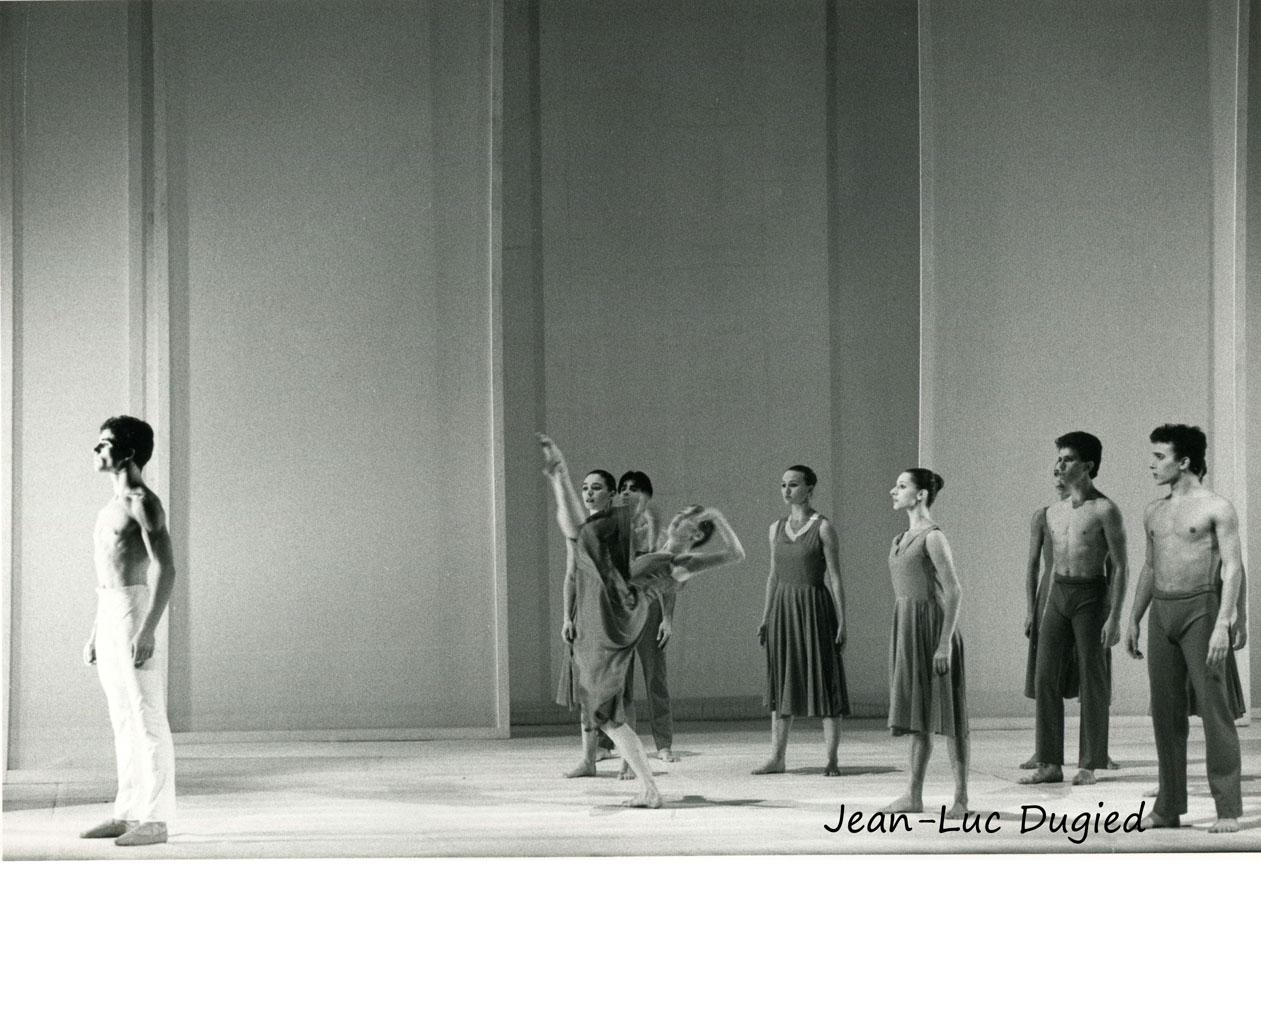 30 Maillot Jean-Christophe - le sacre - 1985